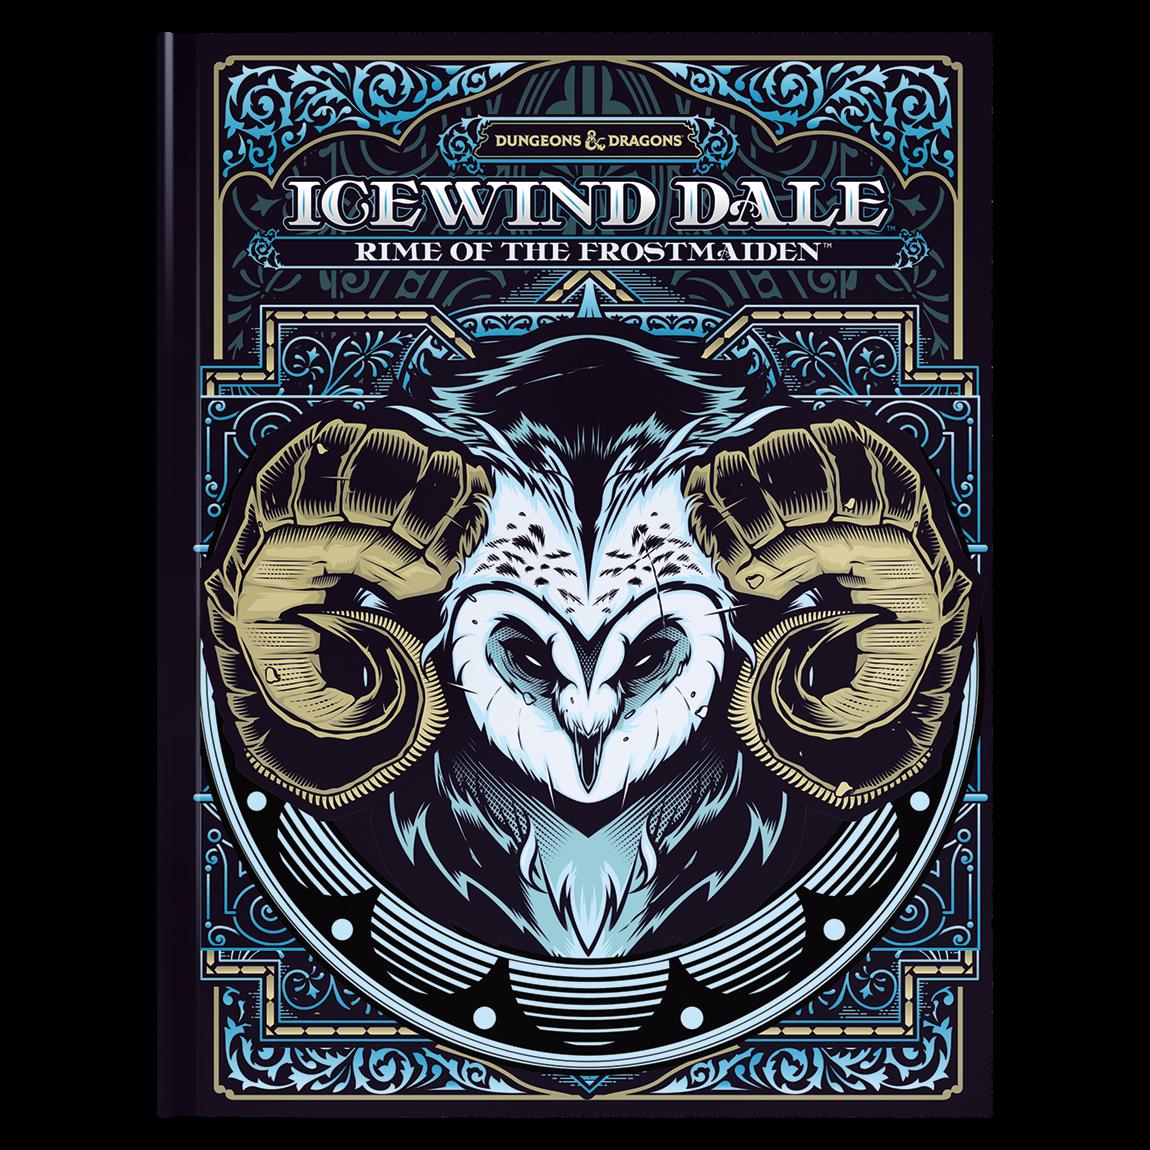 Icewind Dale Alternate